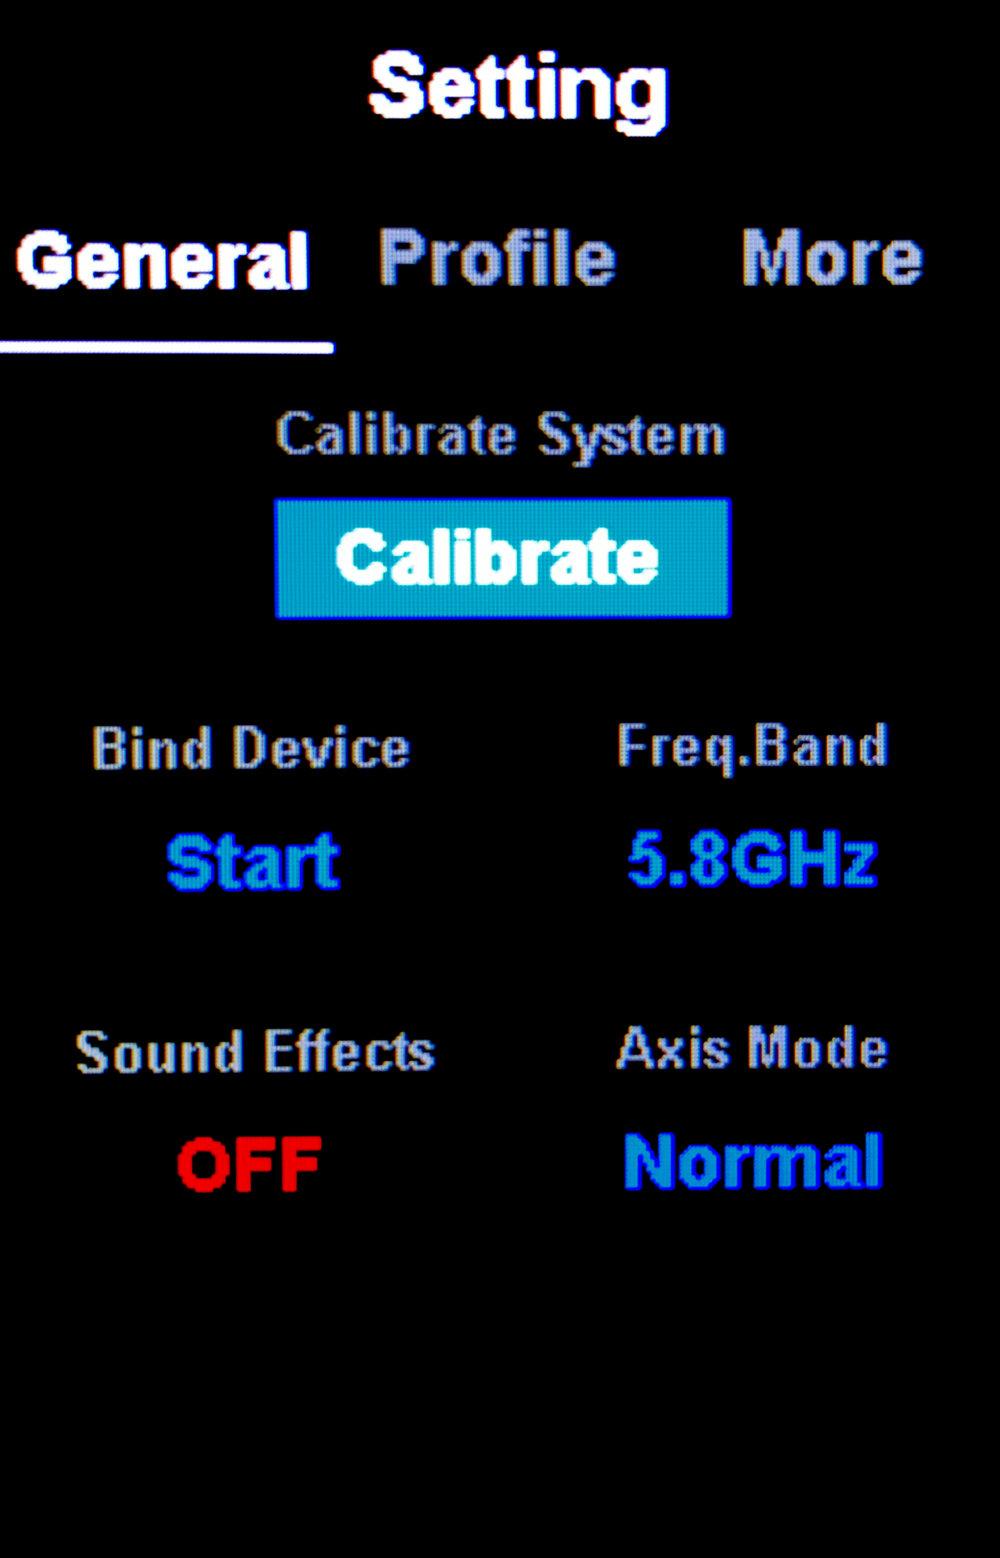 Setting > General > Freq. Band